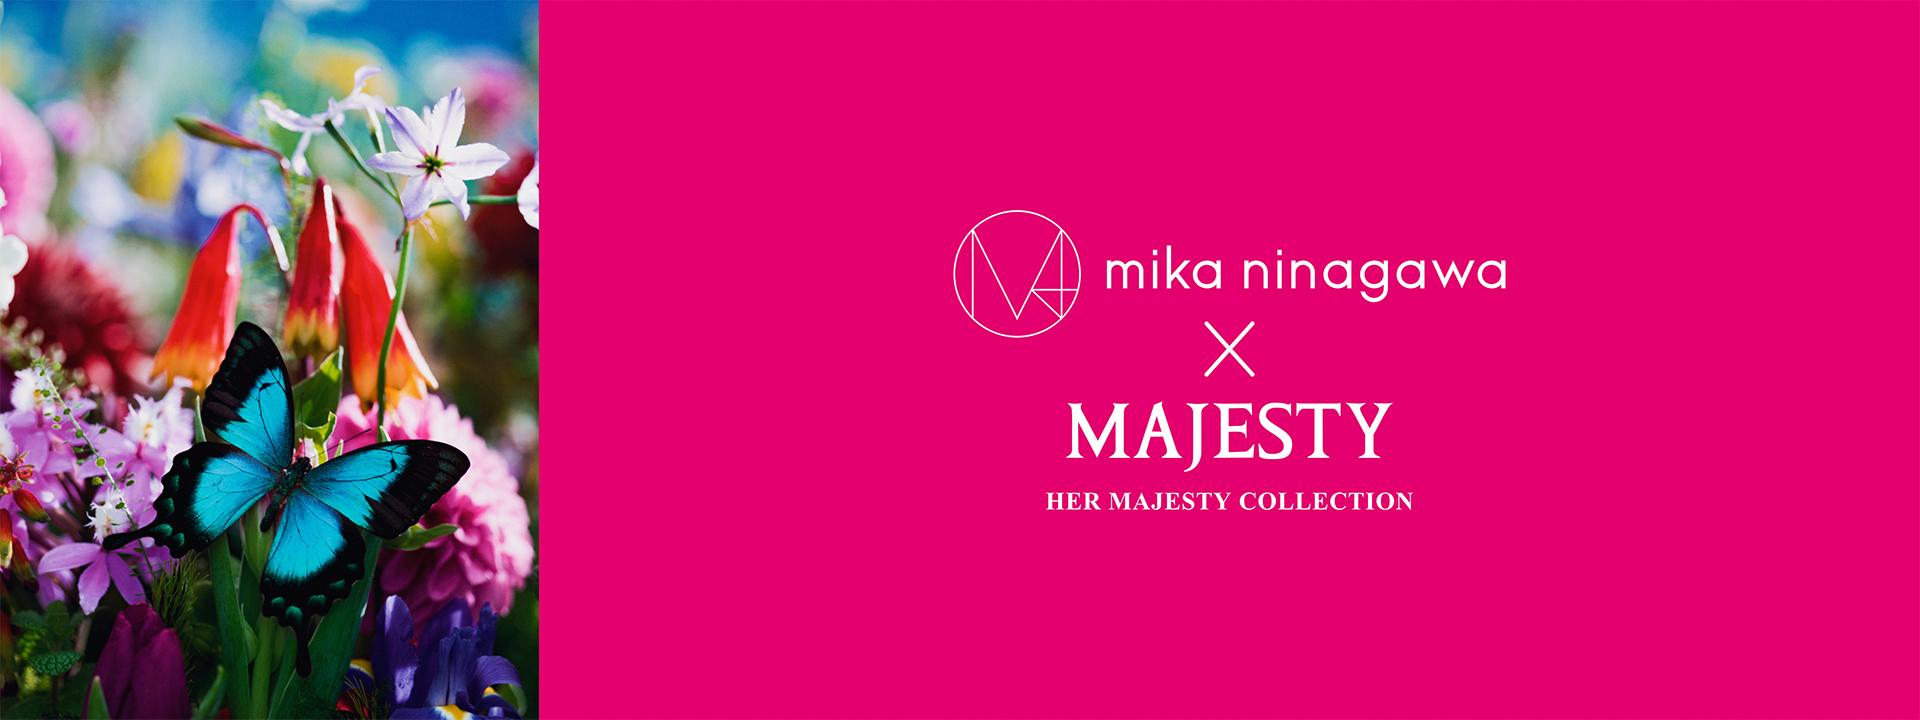 mika ninagawa × MAJESTY HER MAJESTY COLLECTION